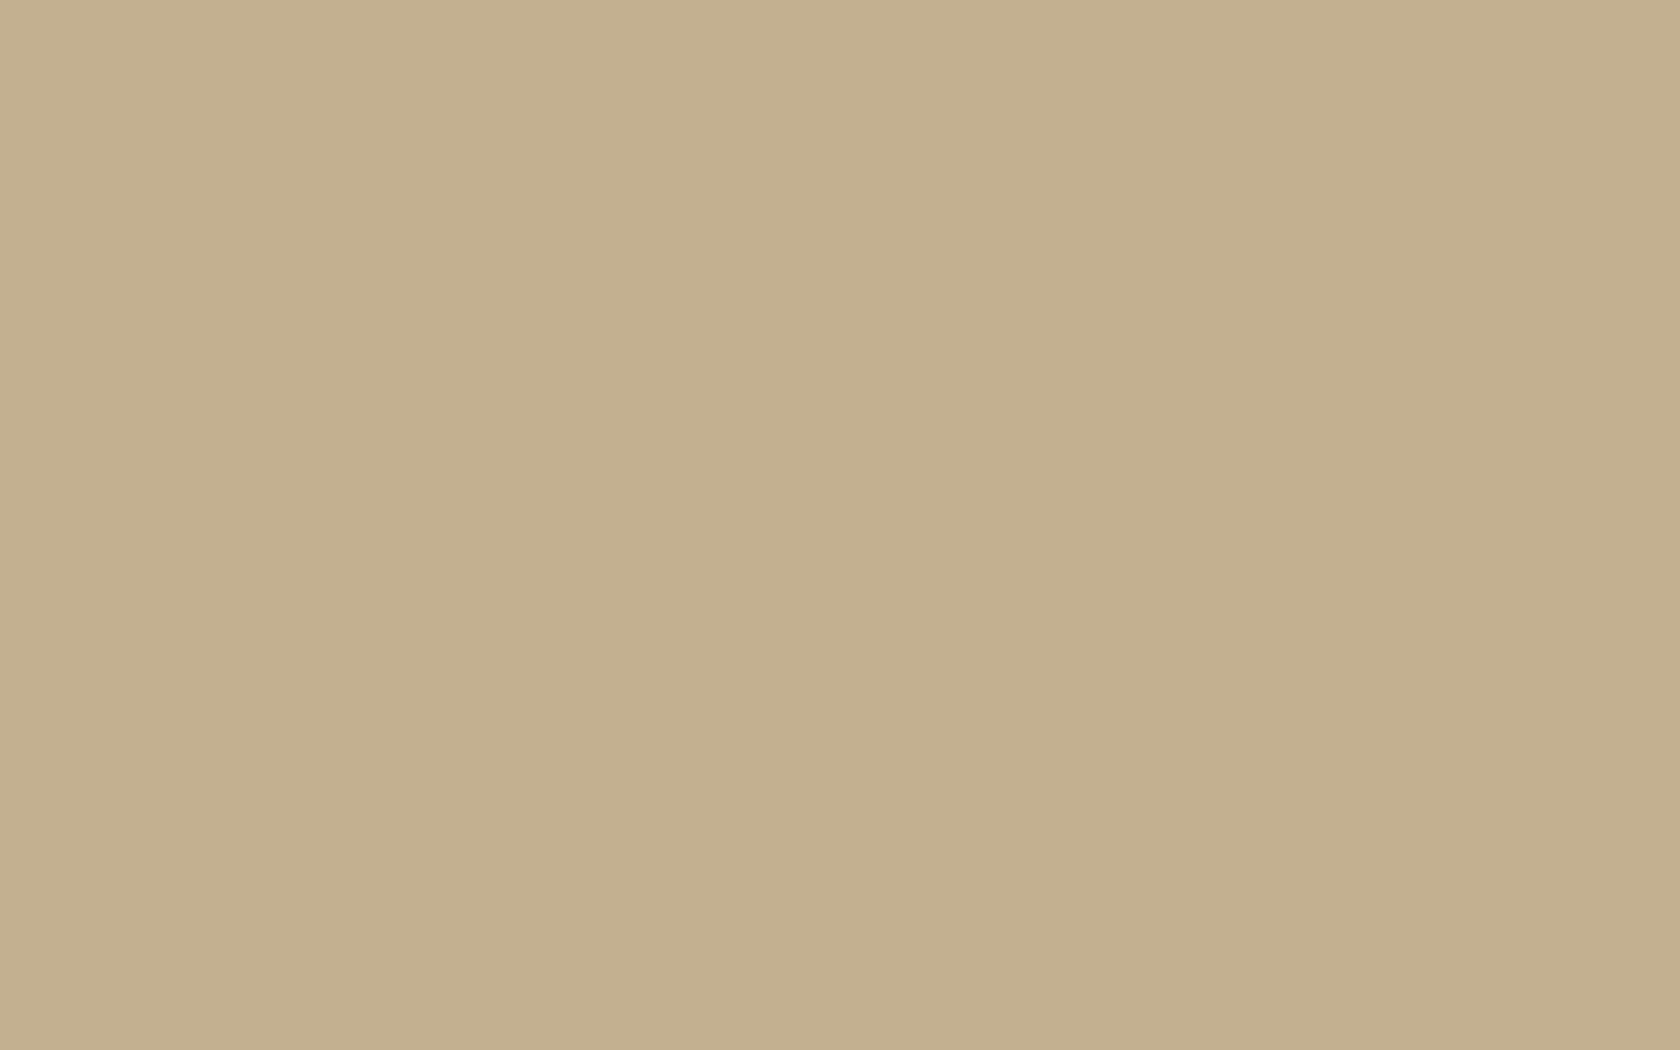 1680x1050 Khaki Web Solid Color Background